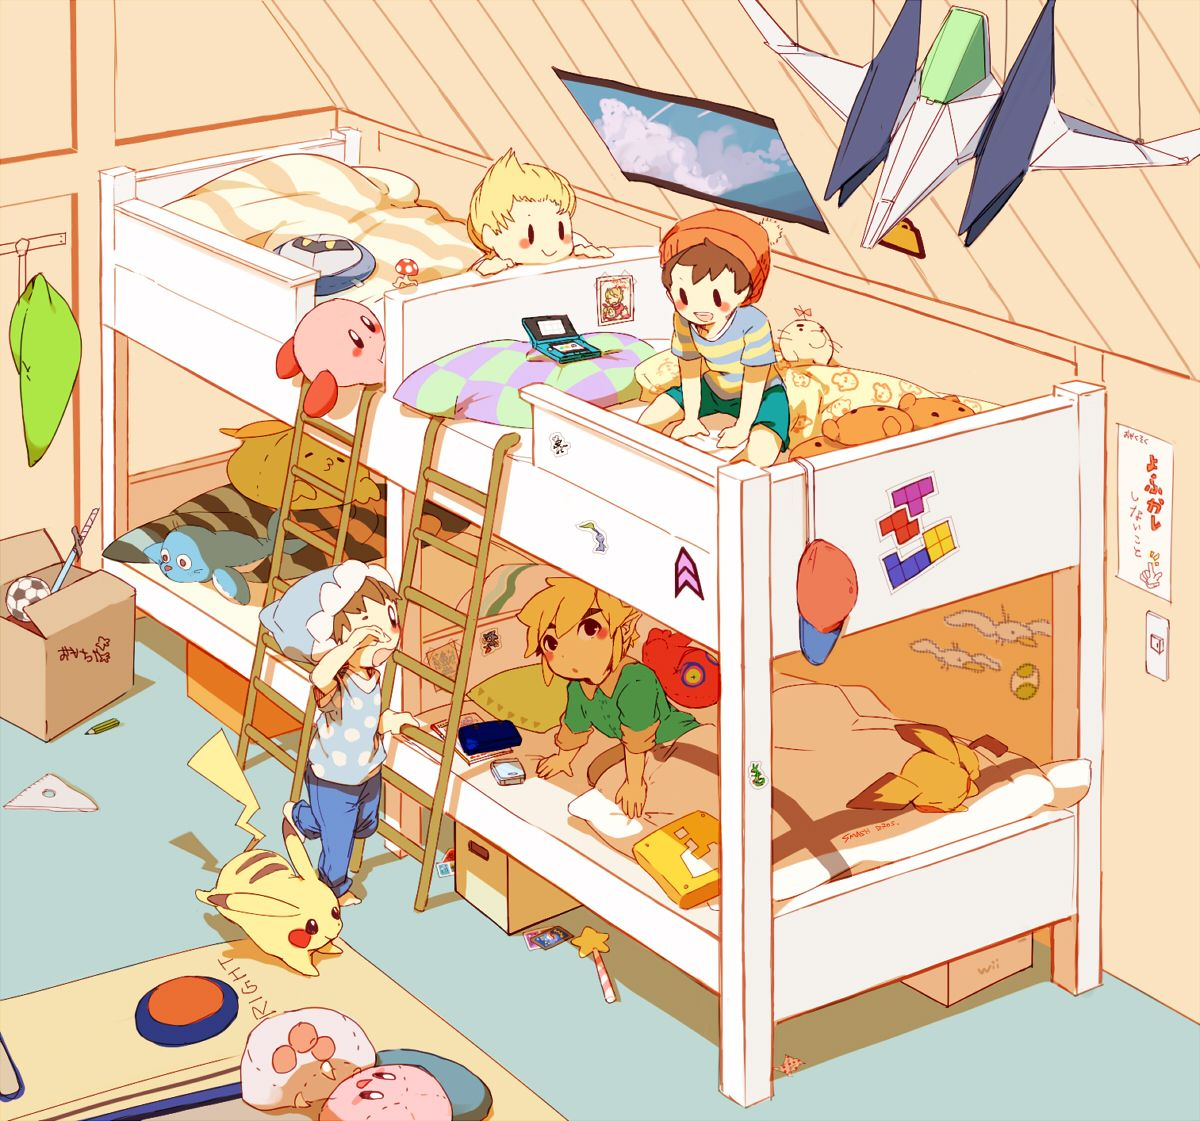 Pokemon Bedroom Wallpaper Cute Nintendo Mashup Art Zelda Pokemon Earthbound Kirby Ice